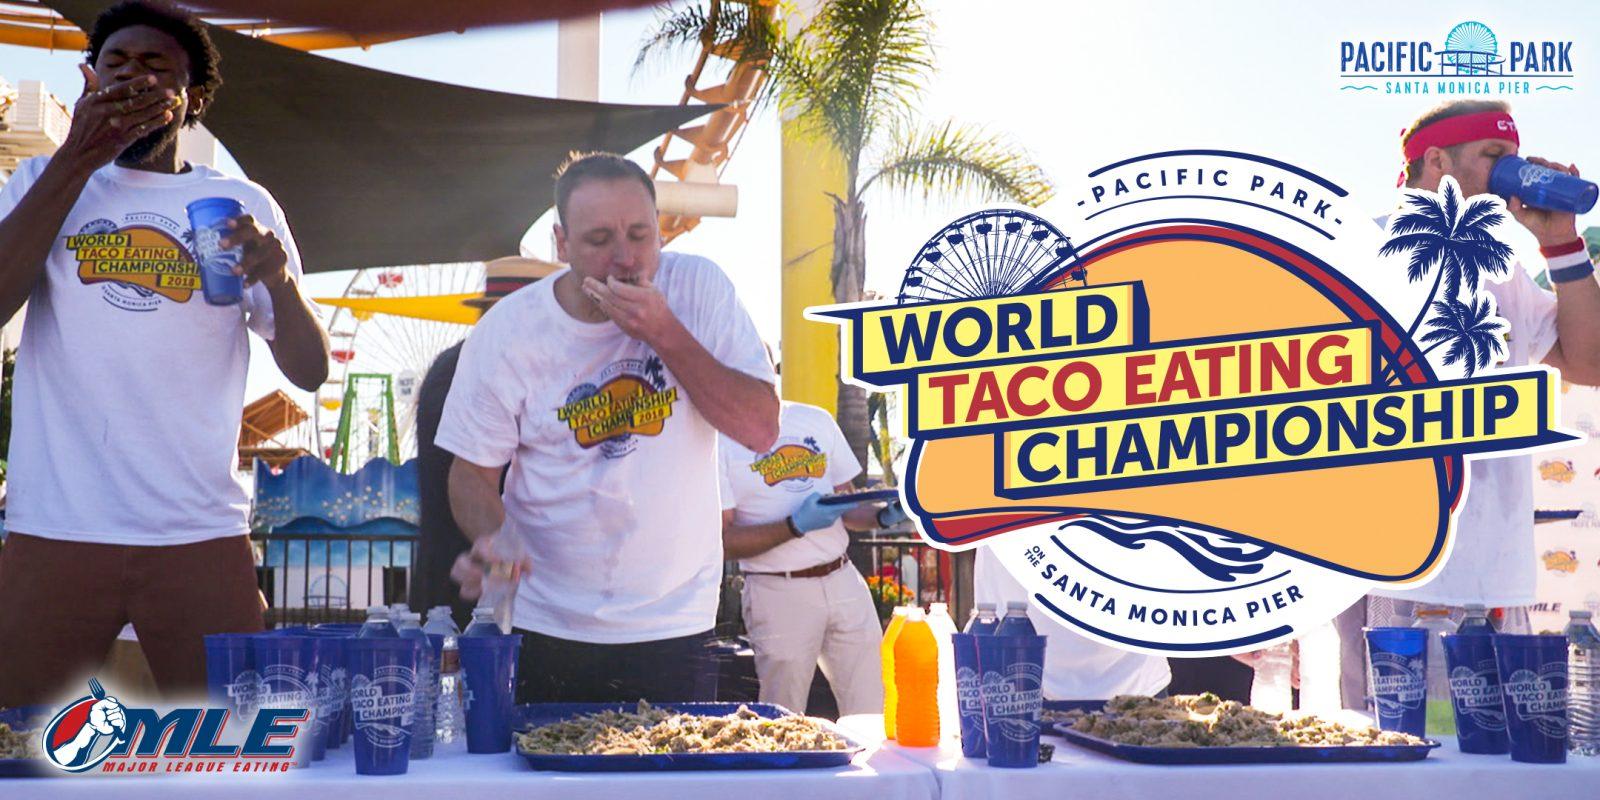 World Taco Eating Championship on the Santa Monica Pier